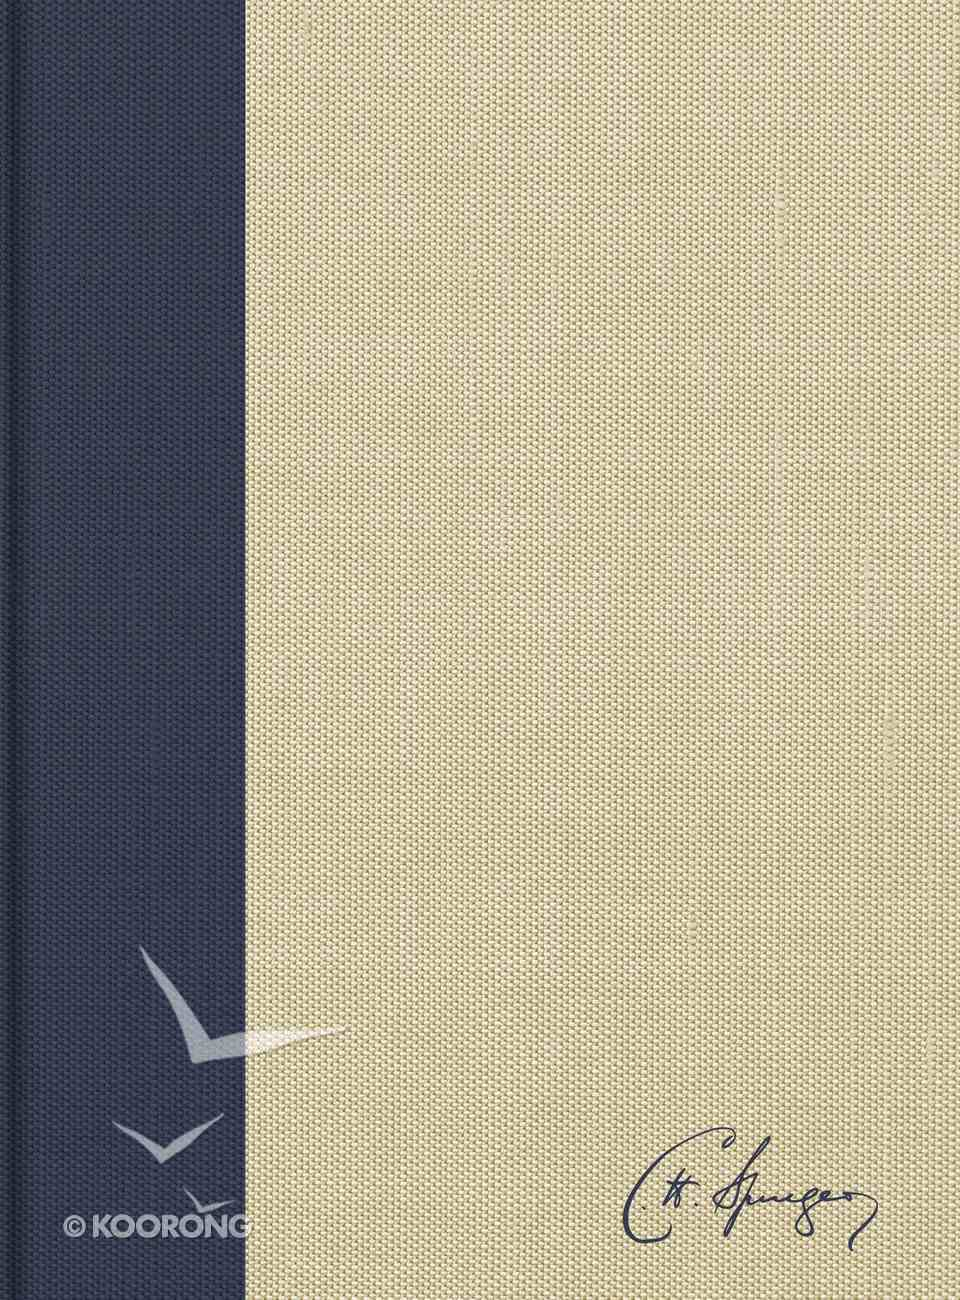 KJV Spurgeon Study Bible Navy/Tan Hardback